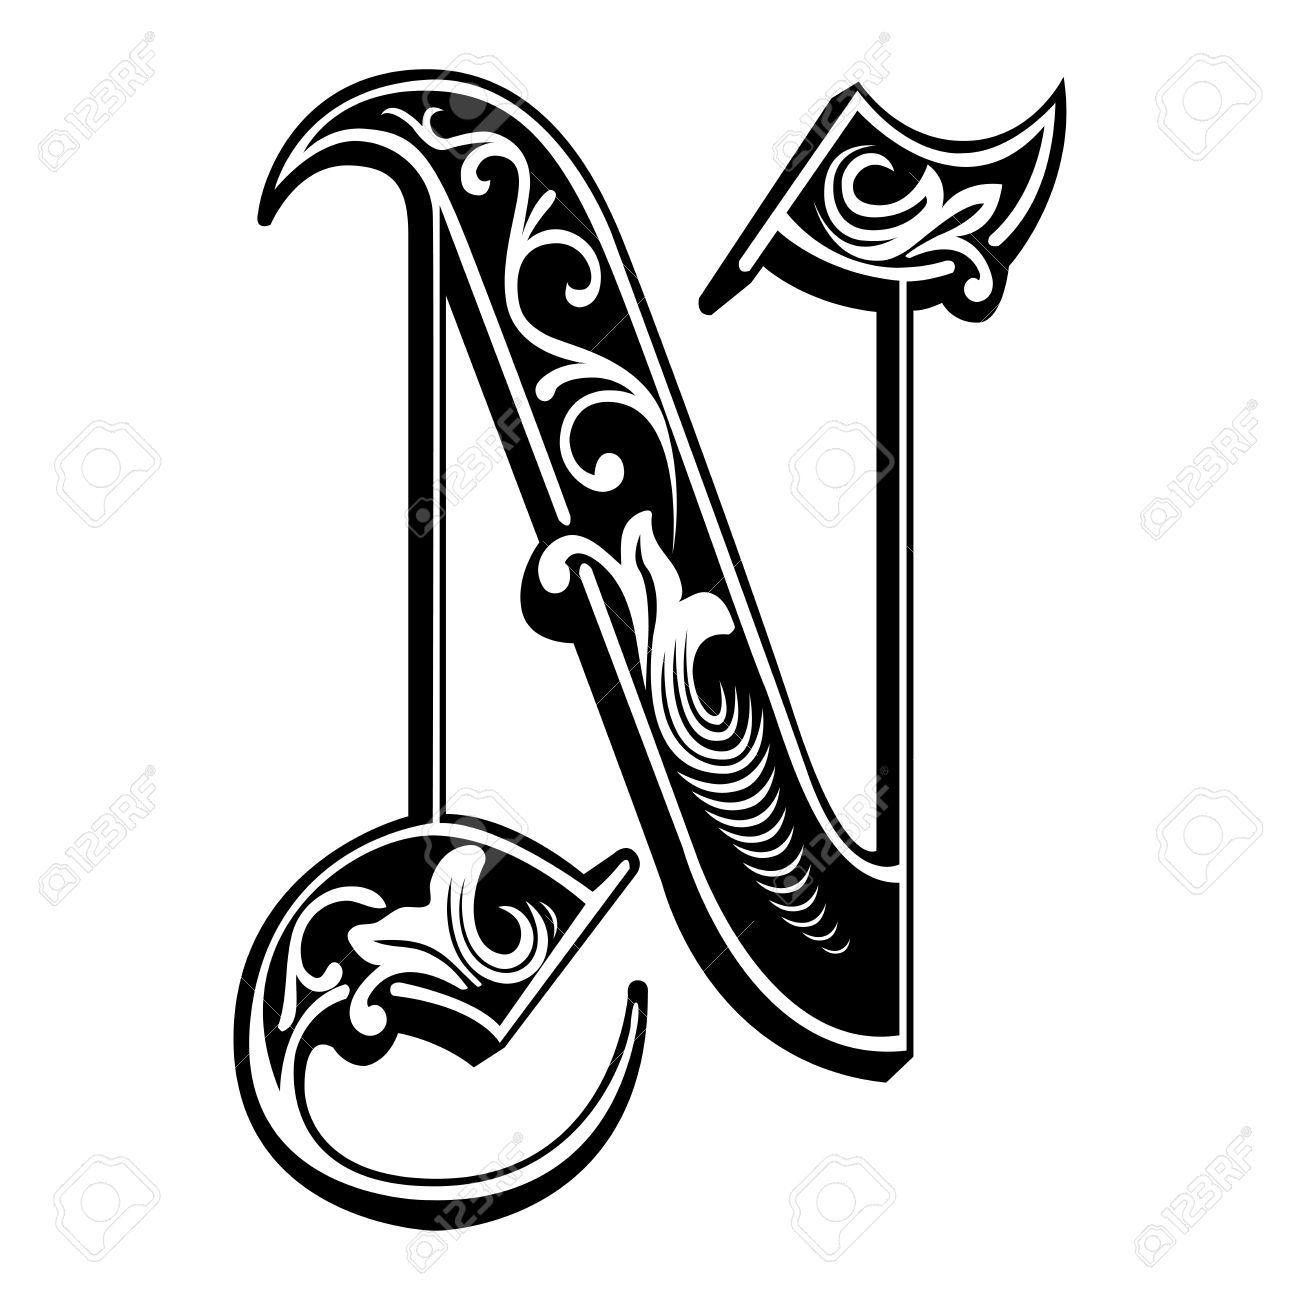 Photo About Garnished English Alphabets Gothic Style Font Letter J Monochrome